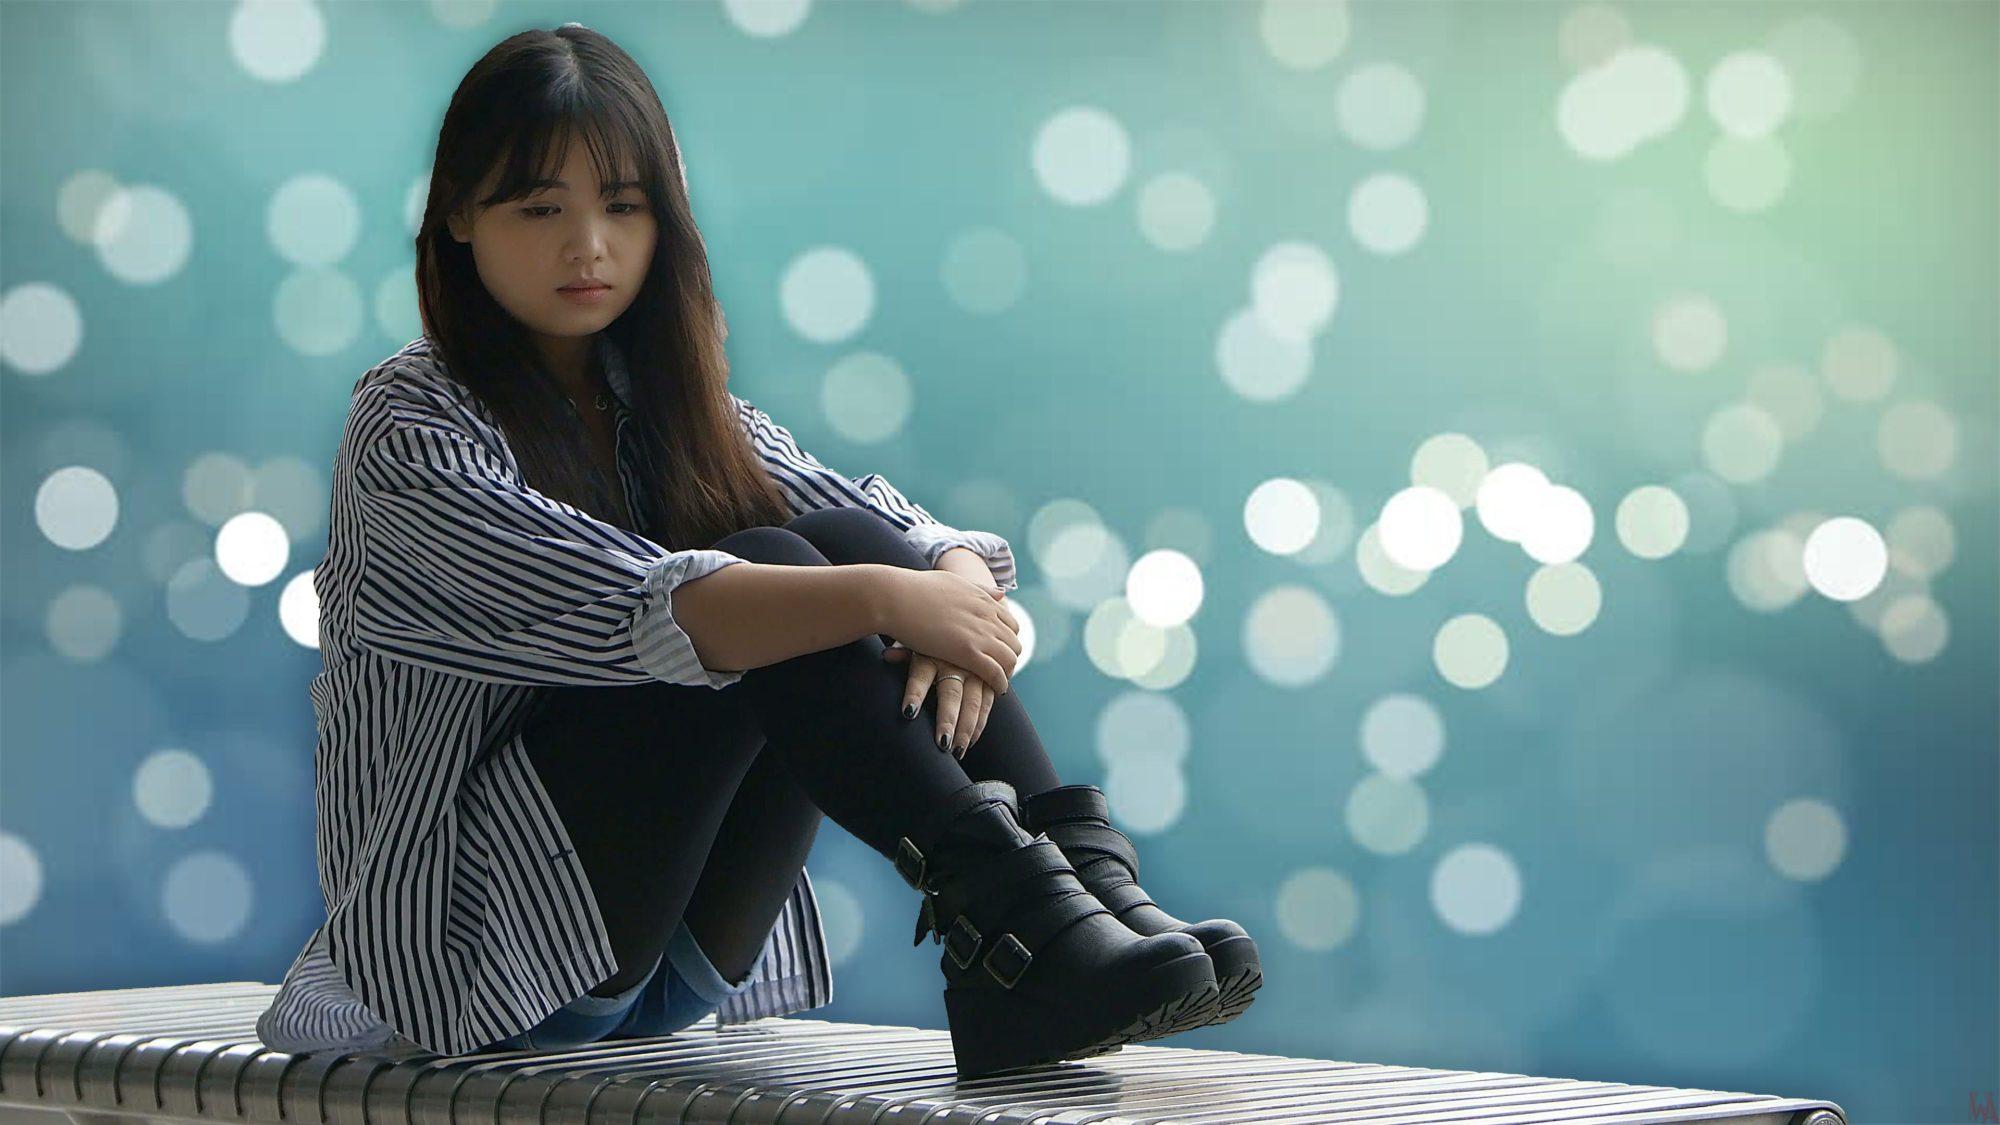 Sad Girl Wallpaper Sad Girl Wallpaper Hd Pictures Free Download